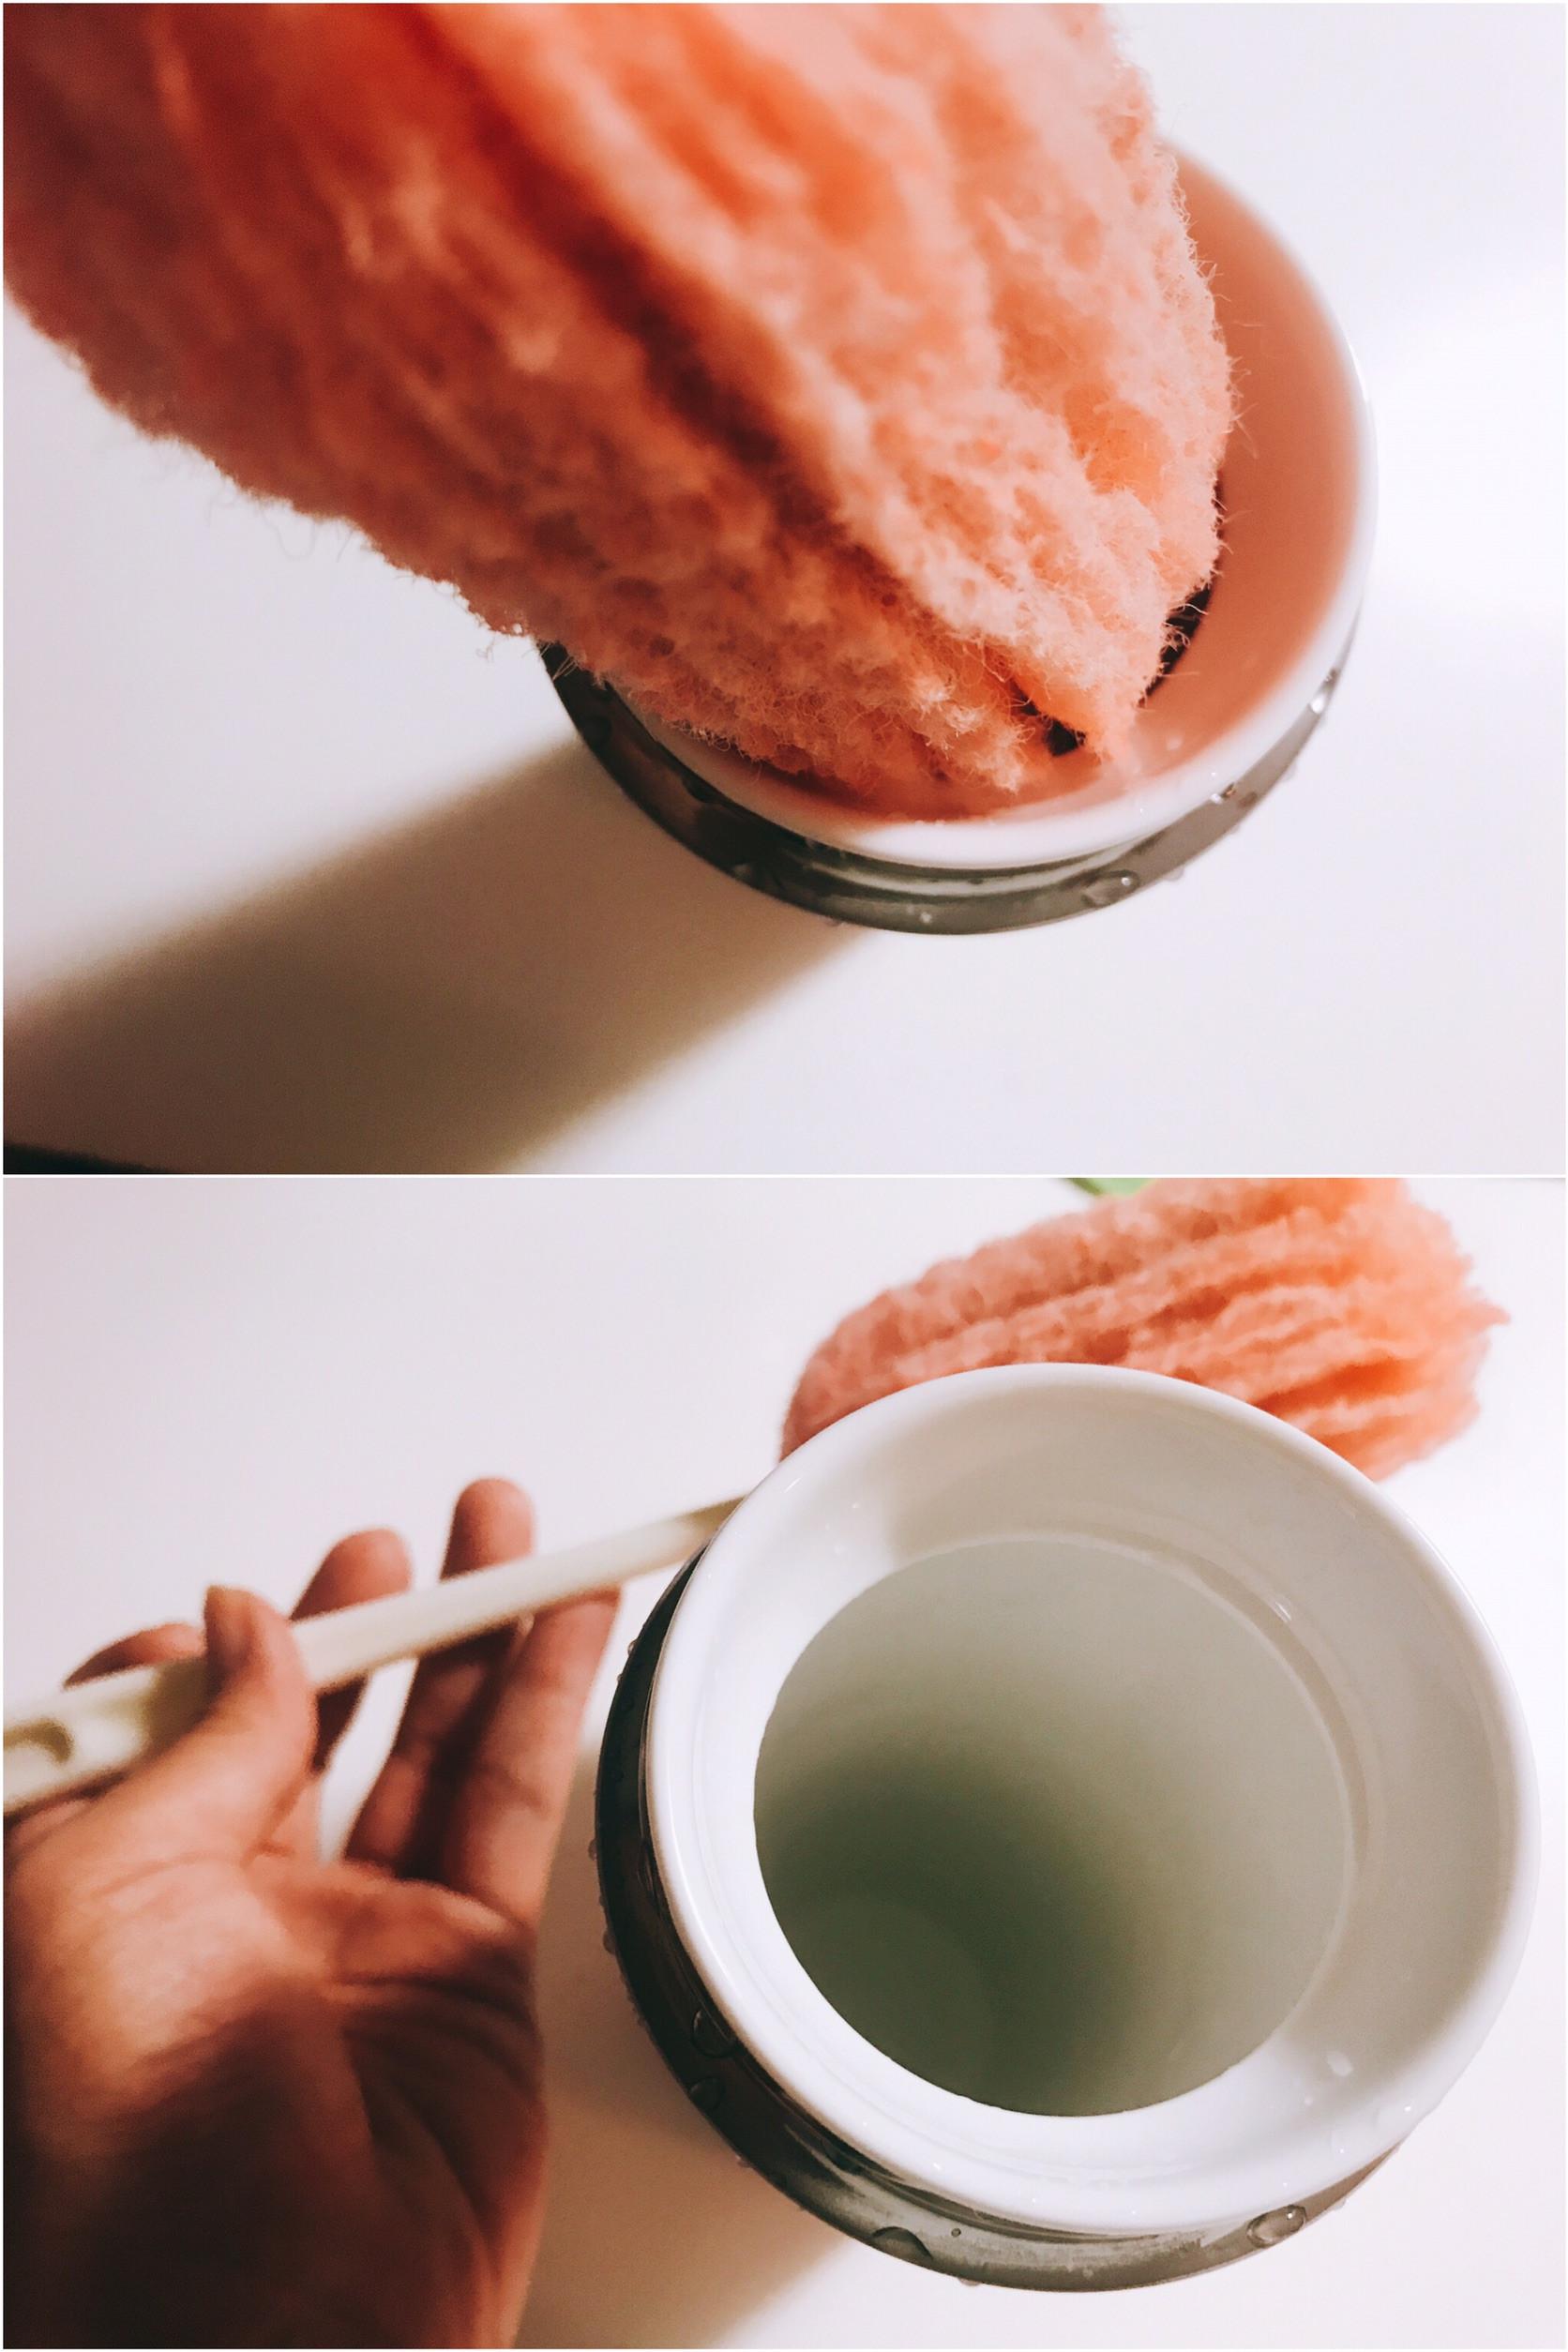 SWANZ陶瓷保溫彈跳杯開箱!雙層真空保溫、不留飲料痕跡的第 6 張圖片